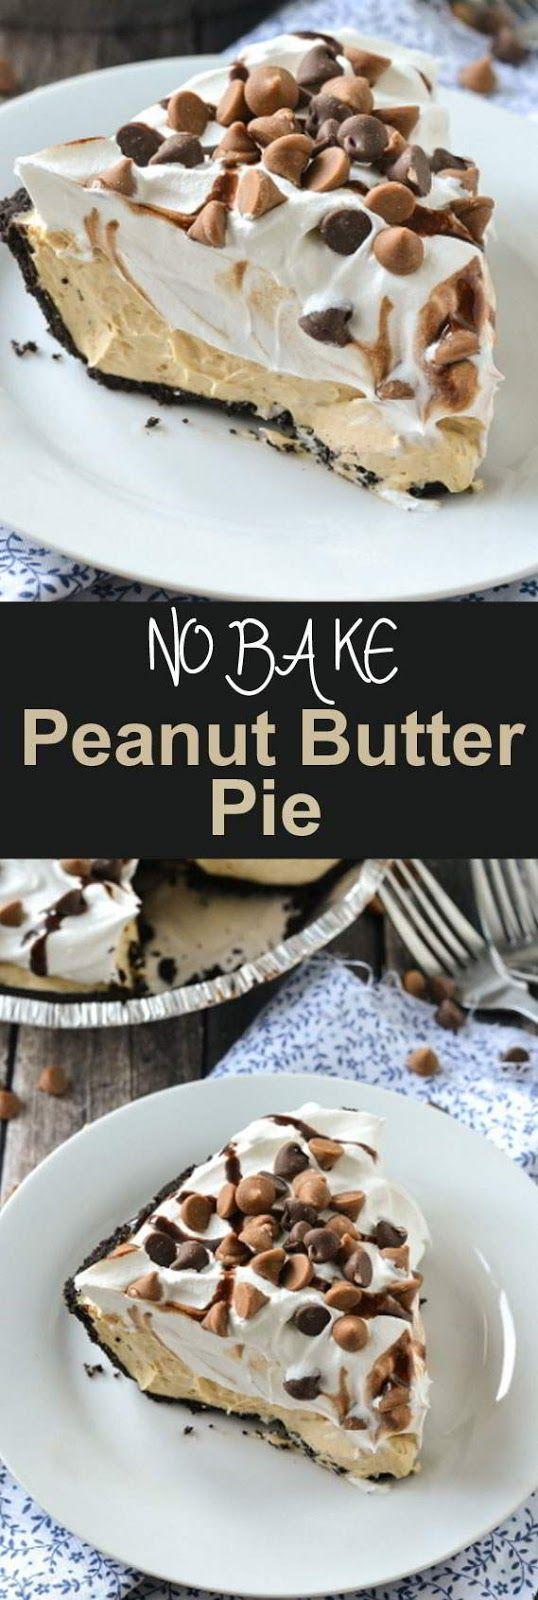 No-Bake Erdnussbutterkuchen    - Sweets - #Erdnussbutterkuchen #NoBake #Sweets #peanutbuttersquares